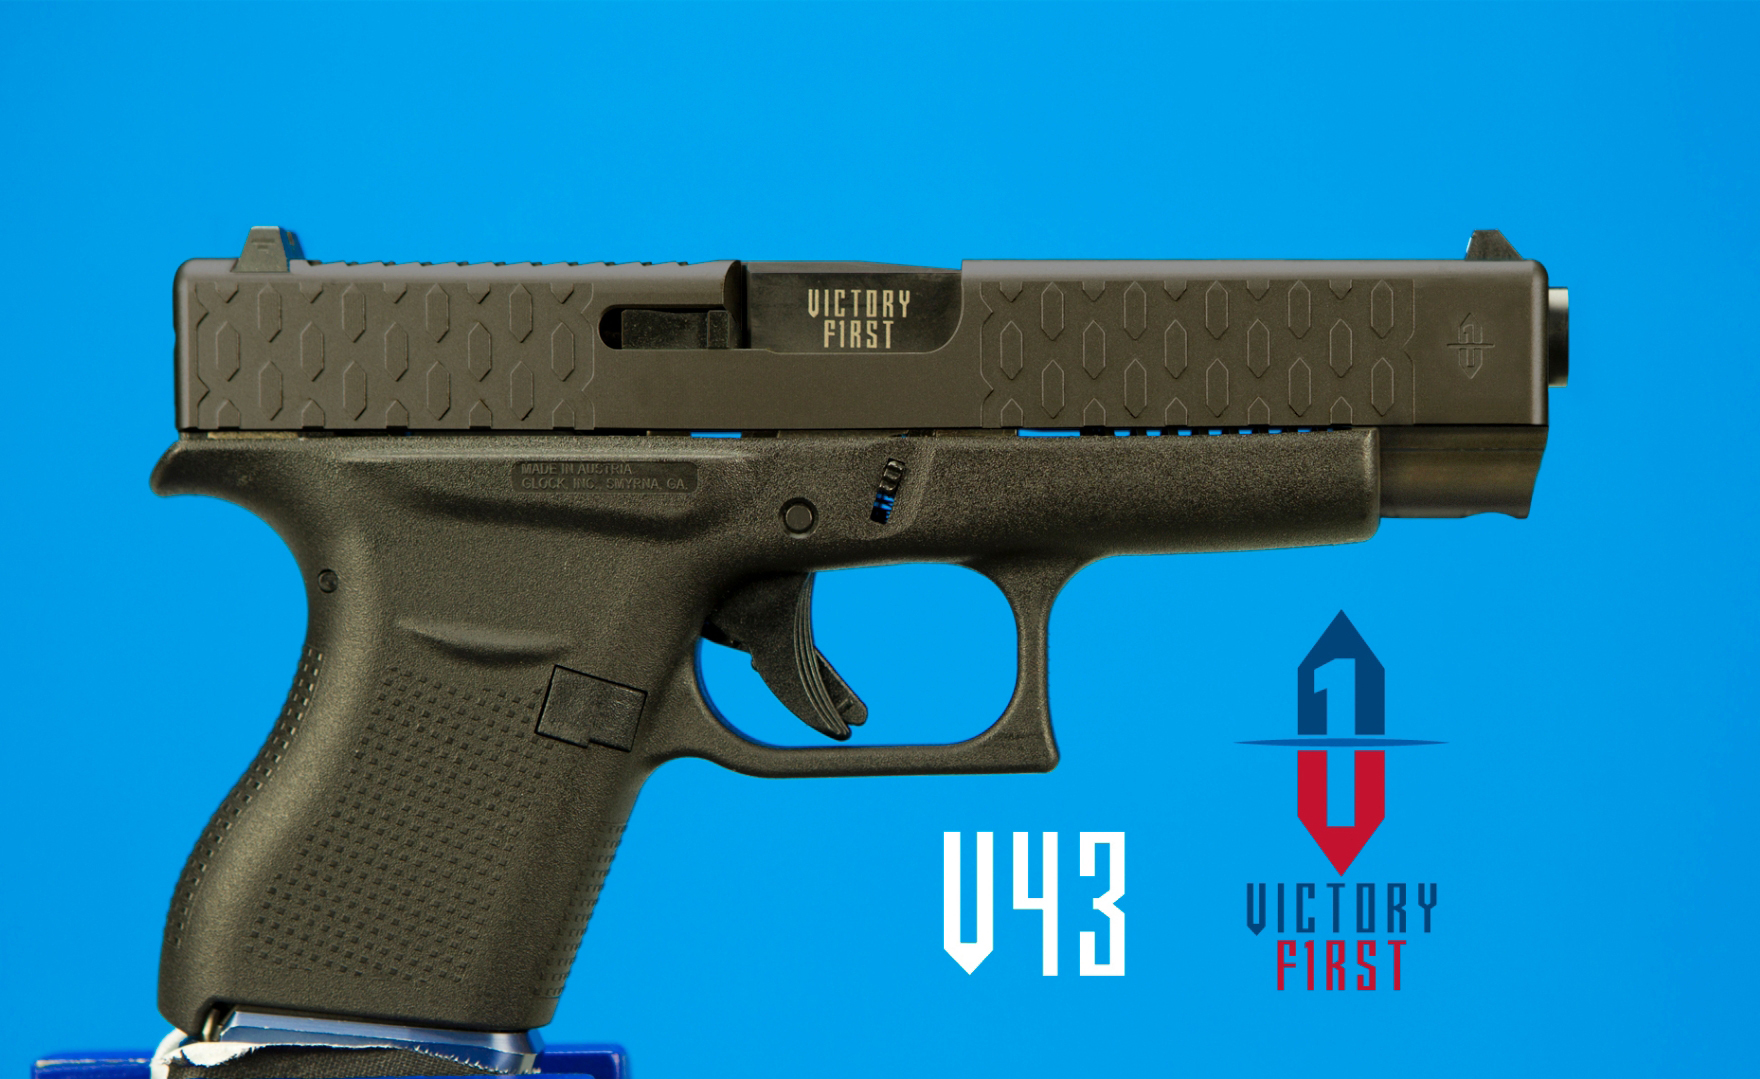 Victory First V43 Glock 43 Upgrade